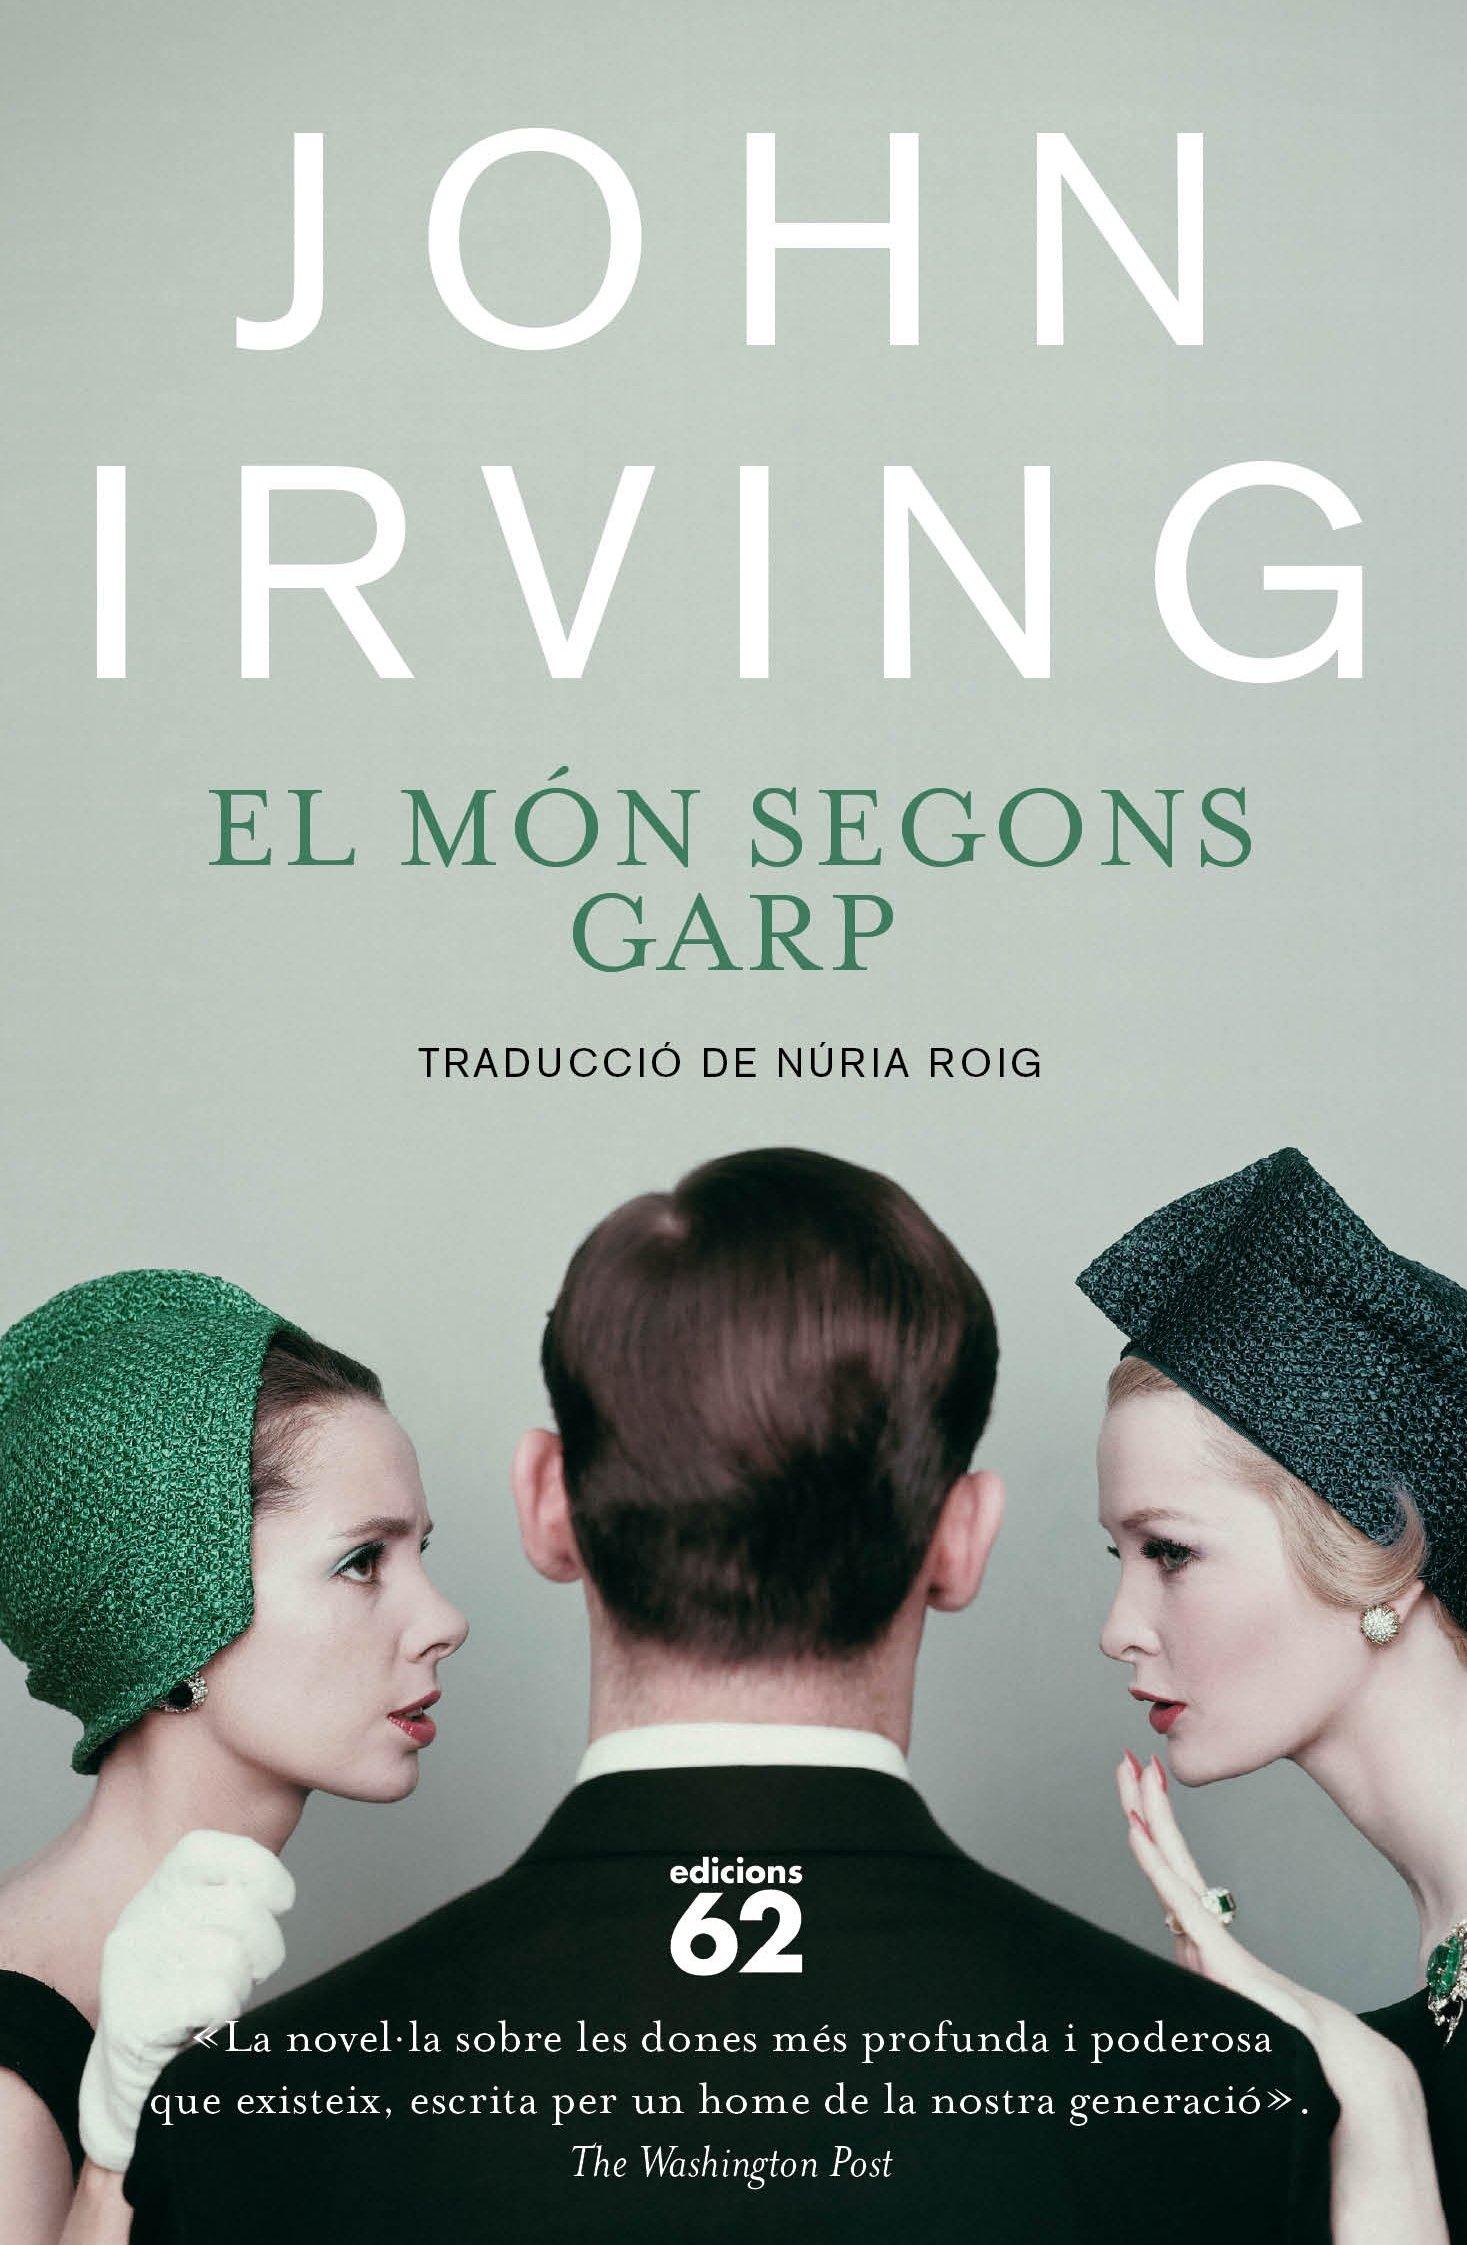 El món segons Garp (Clàssica Book 81) (Catalan Edition)